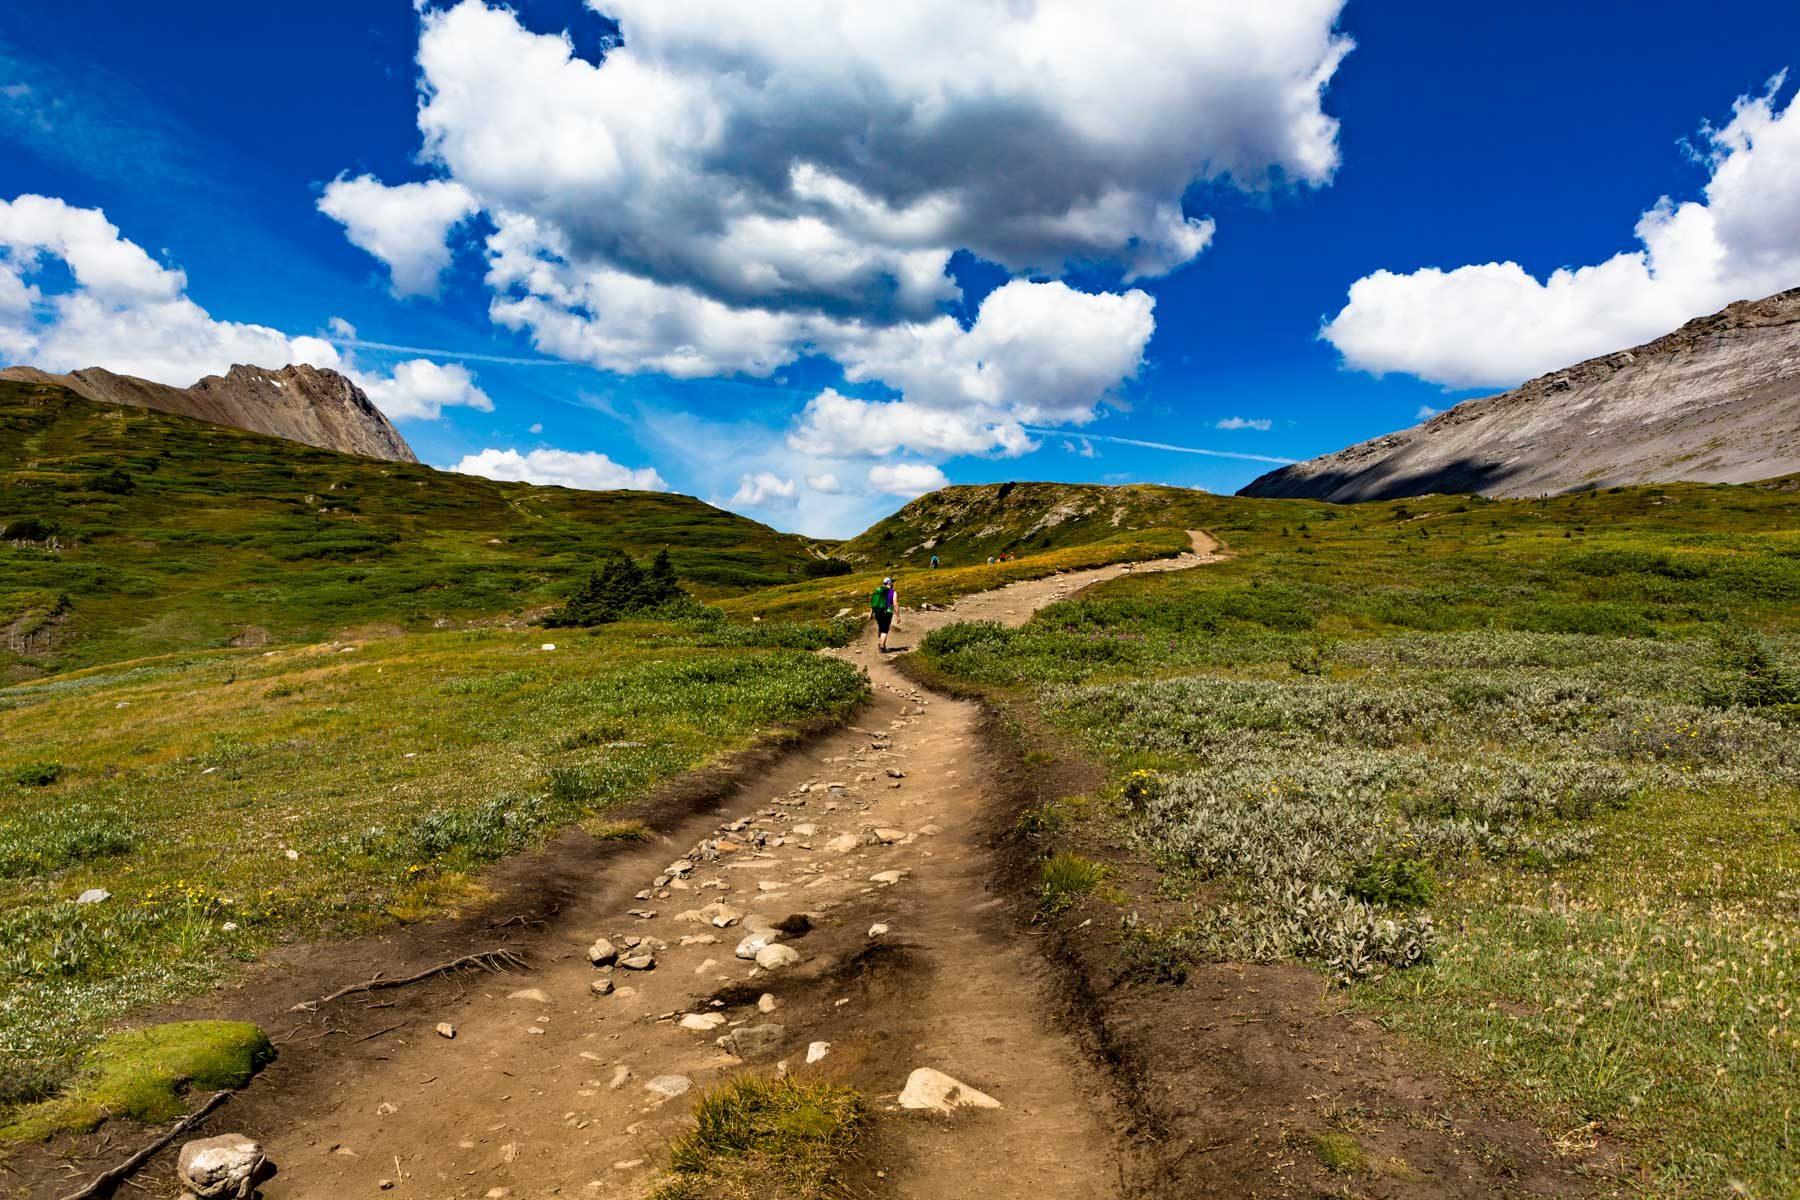 Hiking trail on Wilcox Pass - Jasper, Alberta  - Tracey Sawatzky, Adventure Photographer